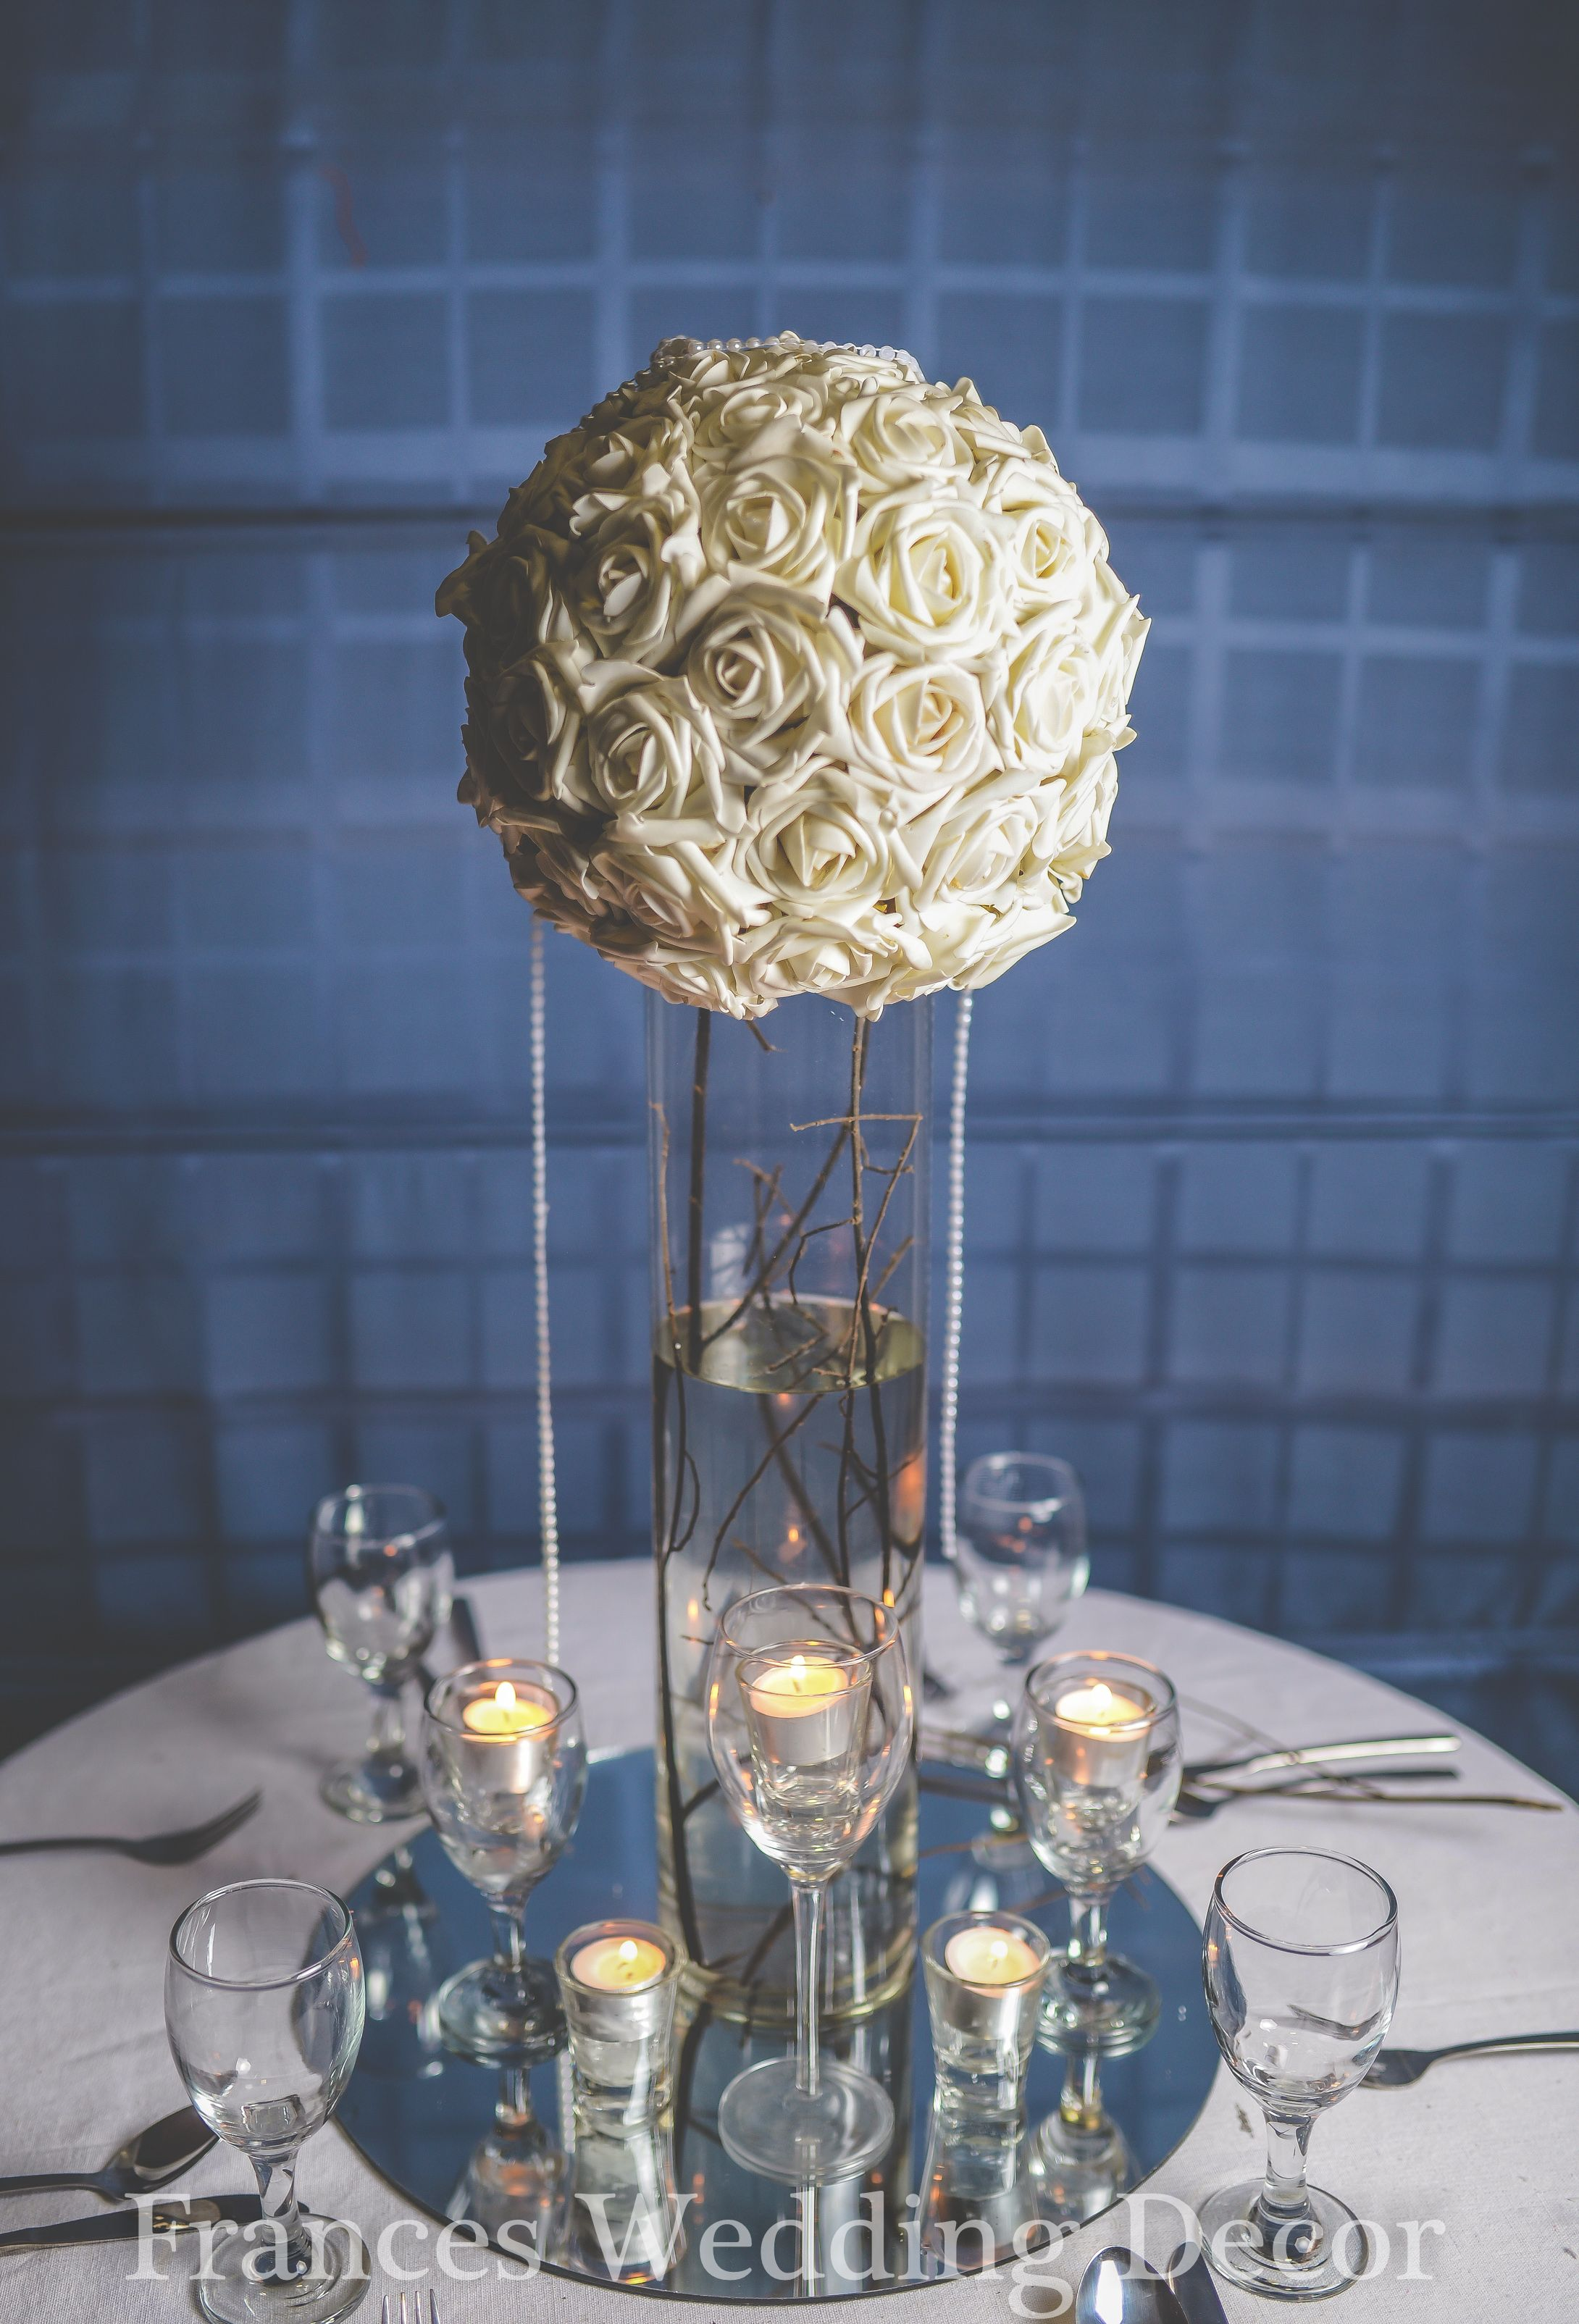 Srilankan wedding - frances wedding decor - weddings in Sri Lanka table centerpiece #SriLanka # ...